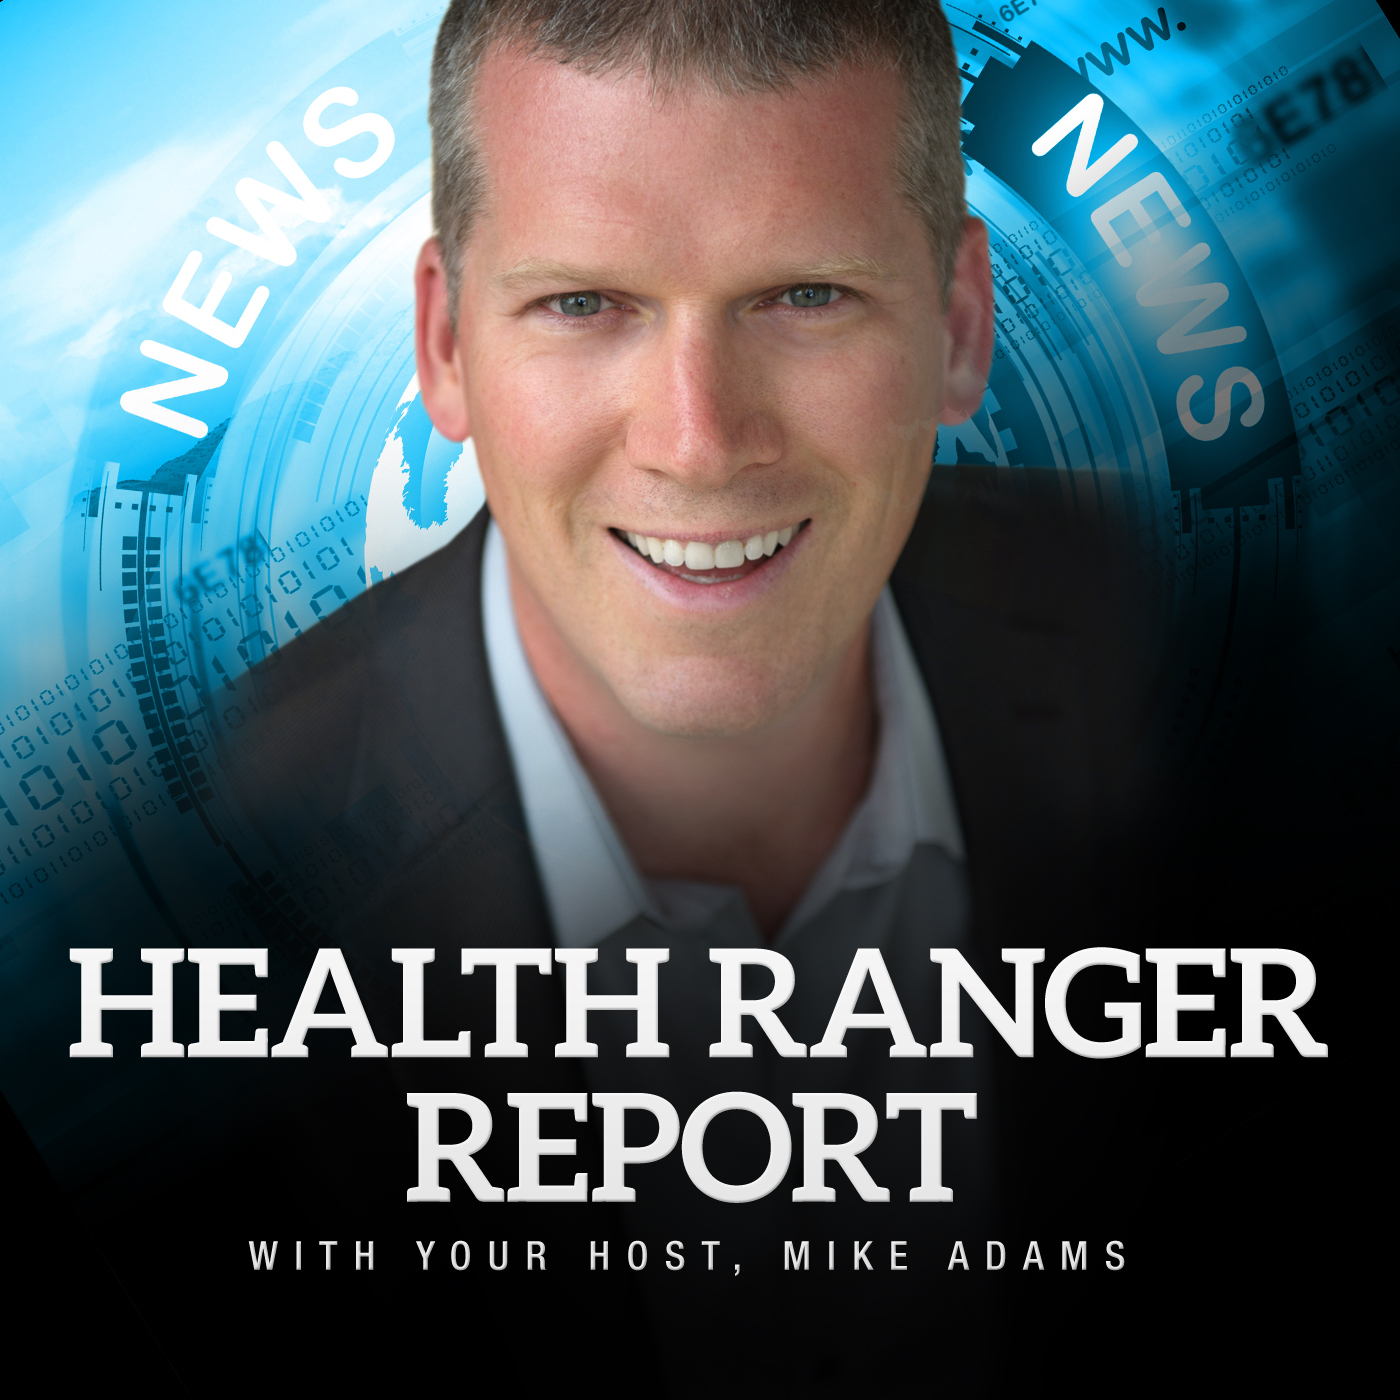 The Health Ranger Report